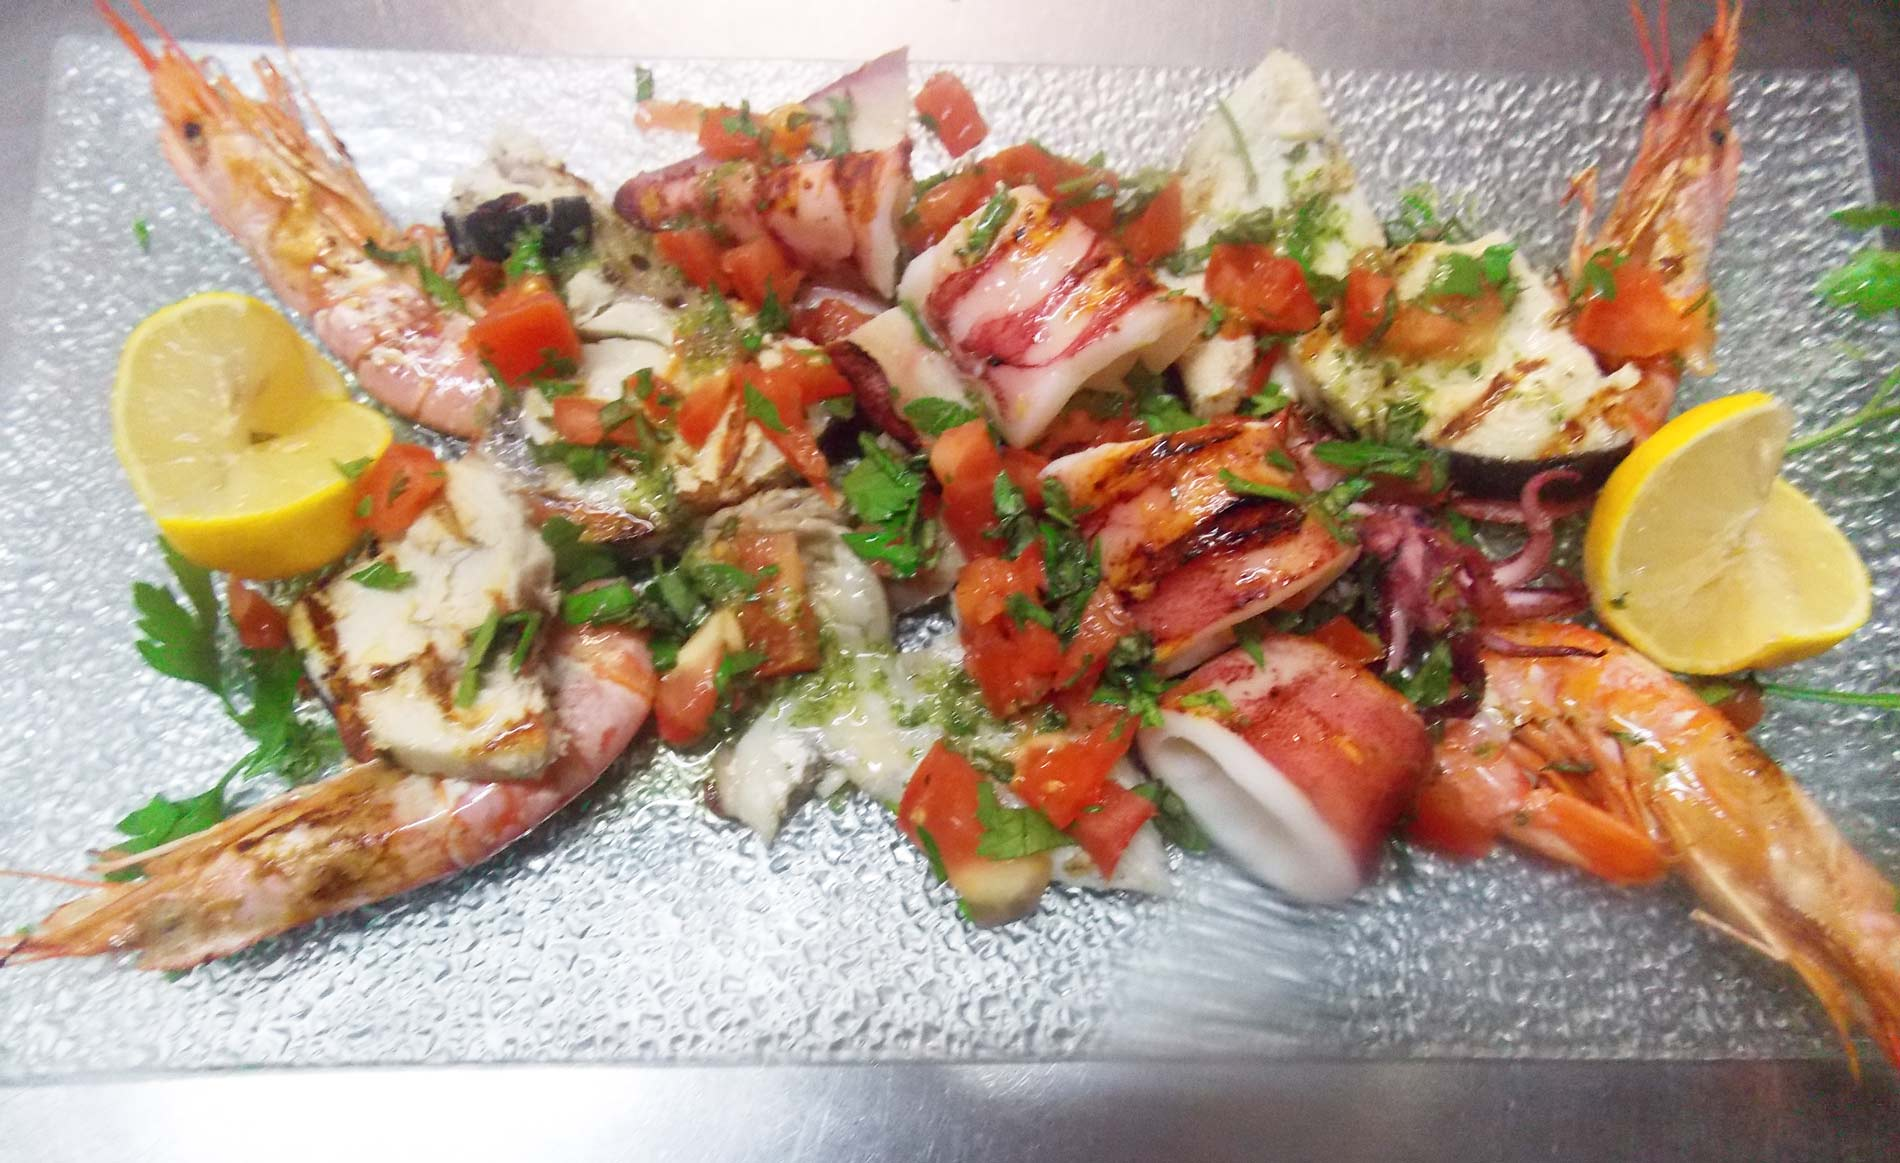 ristorante-pizzeria-La-Perla-Rosa-Sassari-gamberi-e-calamari-arrosto.jpg-2